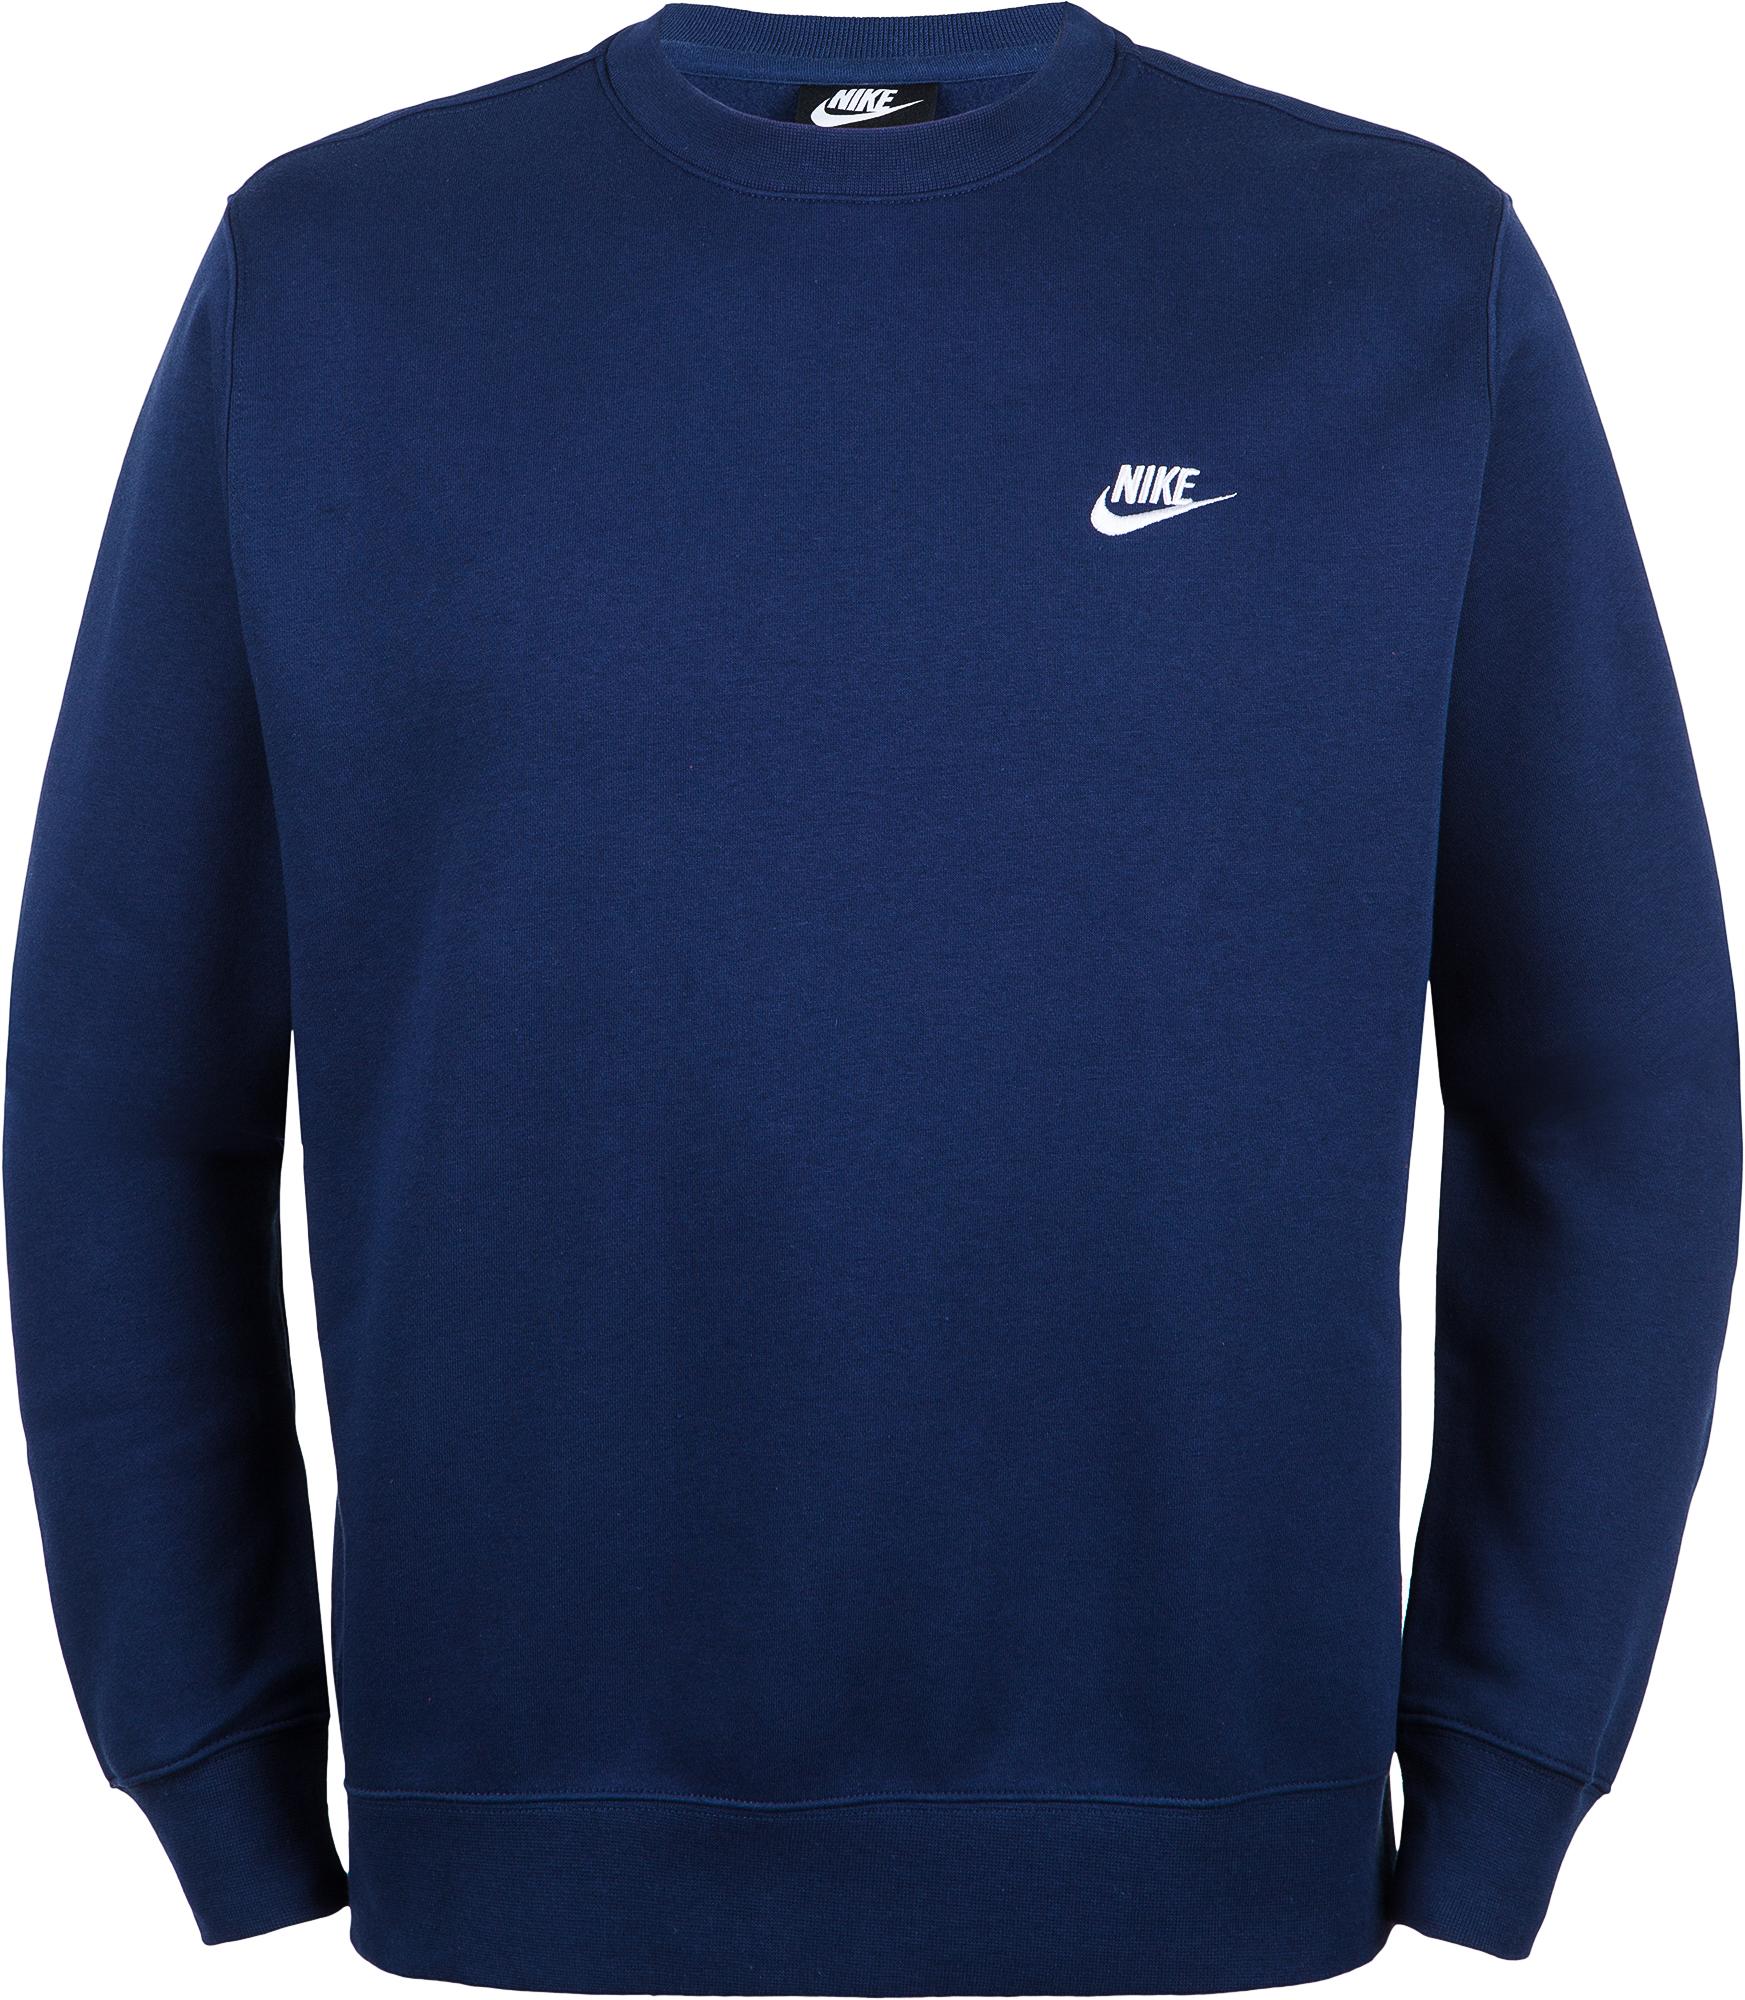 Фото - Nike Свитшот мужской Nike Sportswear Club, размер 46-48 nike свитшот мужской nike sportswear just do it размер 52 54